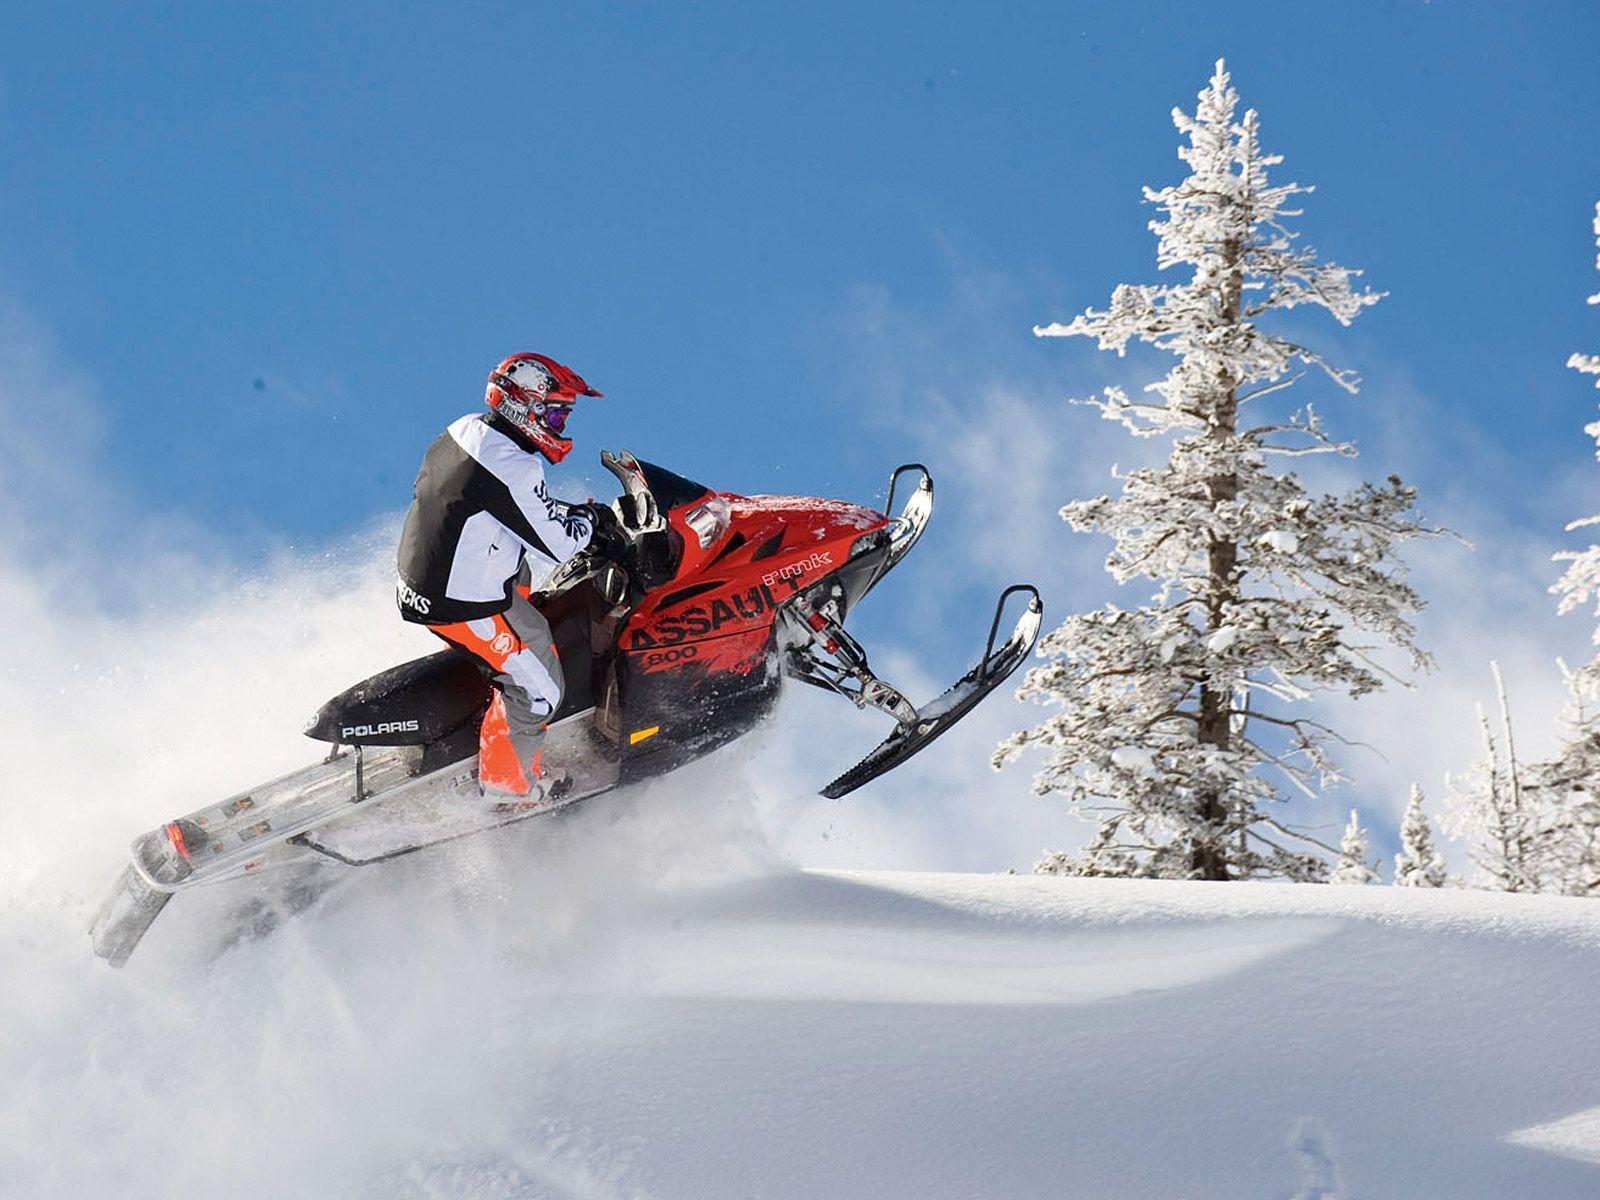 1600x1200 Cool Snowmobile Wallpaper 42223 1600x1200 px ~ HDWallSource.com